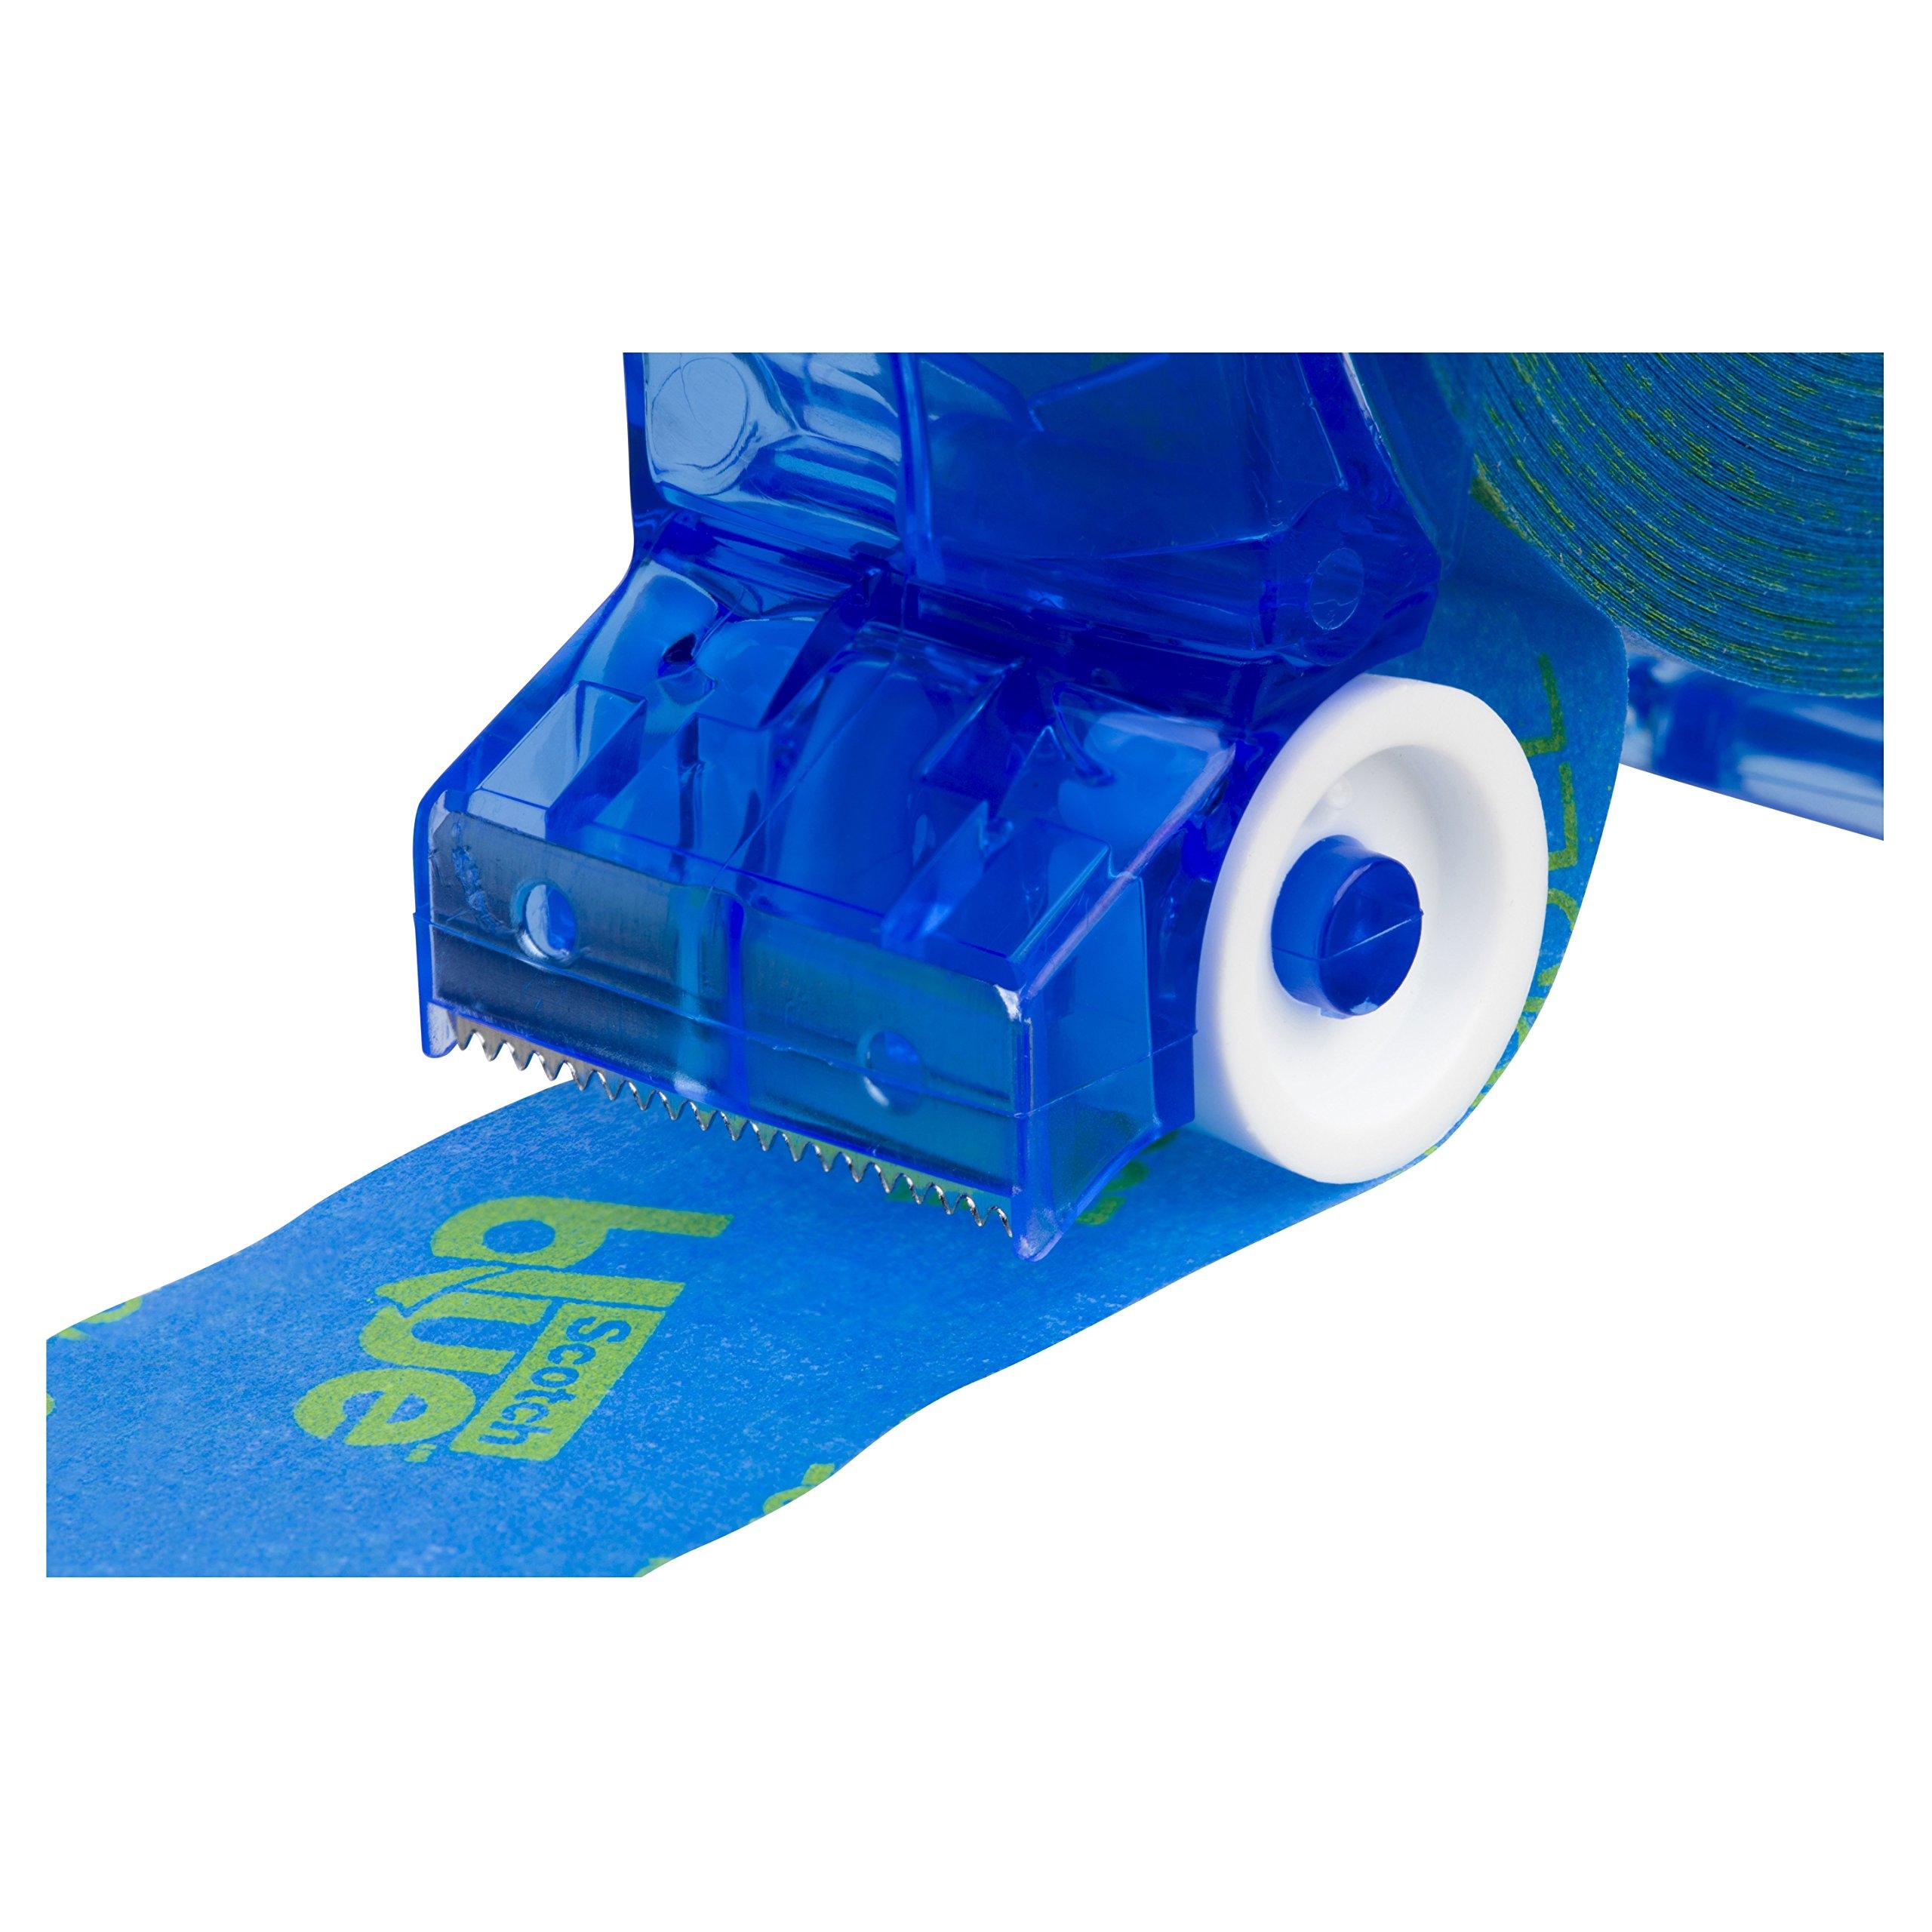 ScotchBlue TRIM + BASEBOARDS Painter's Tape Applicator, 1-Inch x 25-Yards, 1 Roll by ScotchBlue (Image #4)